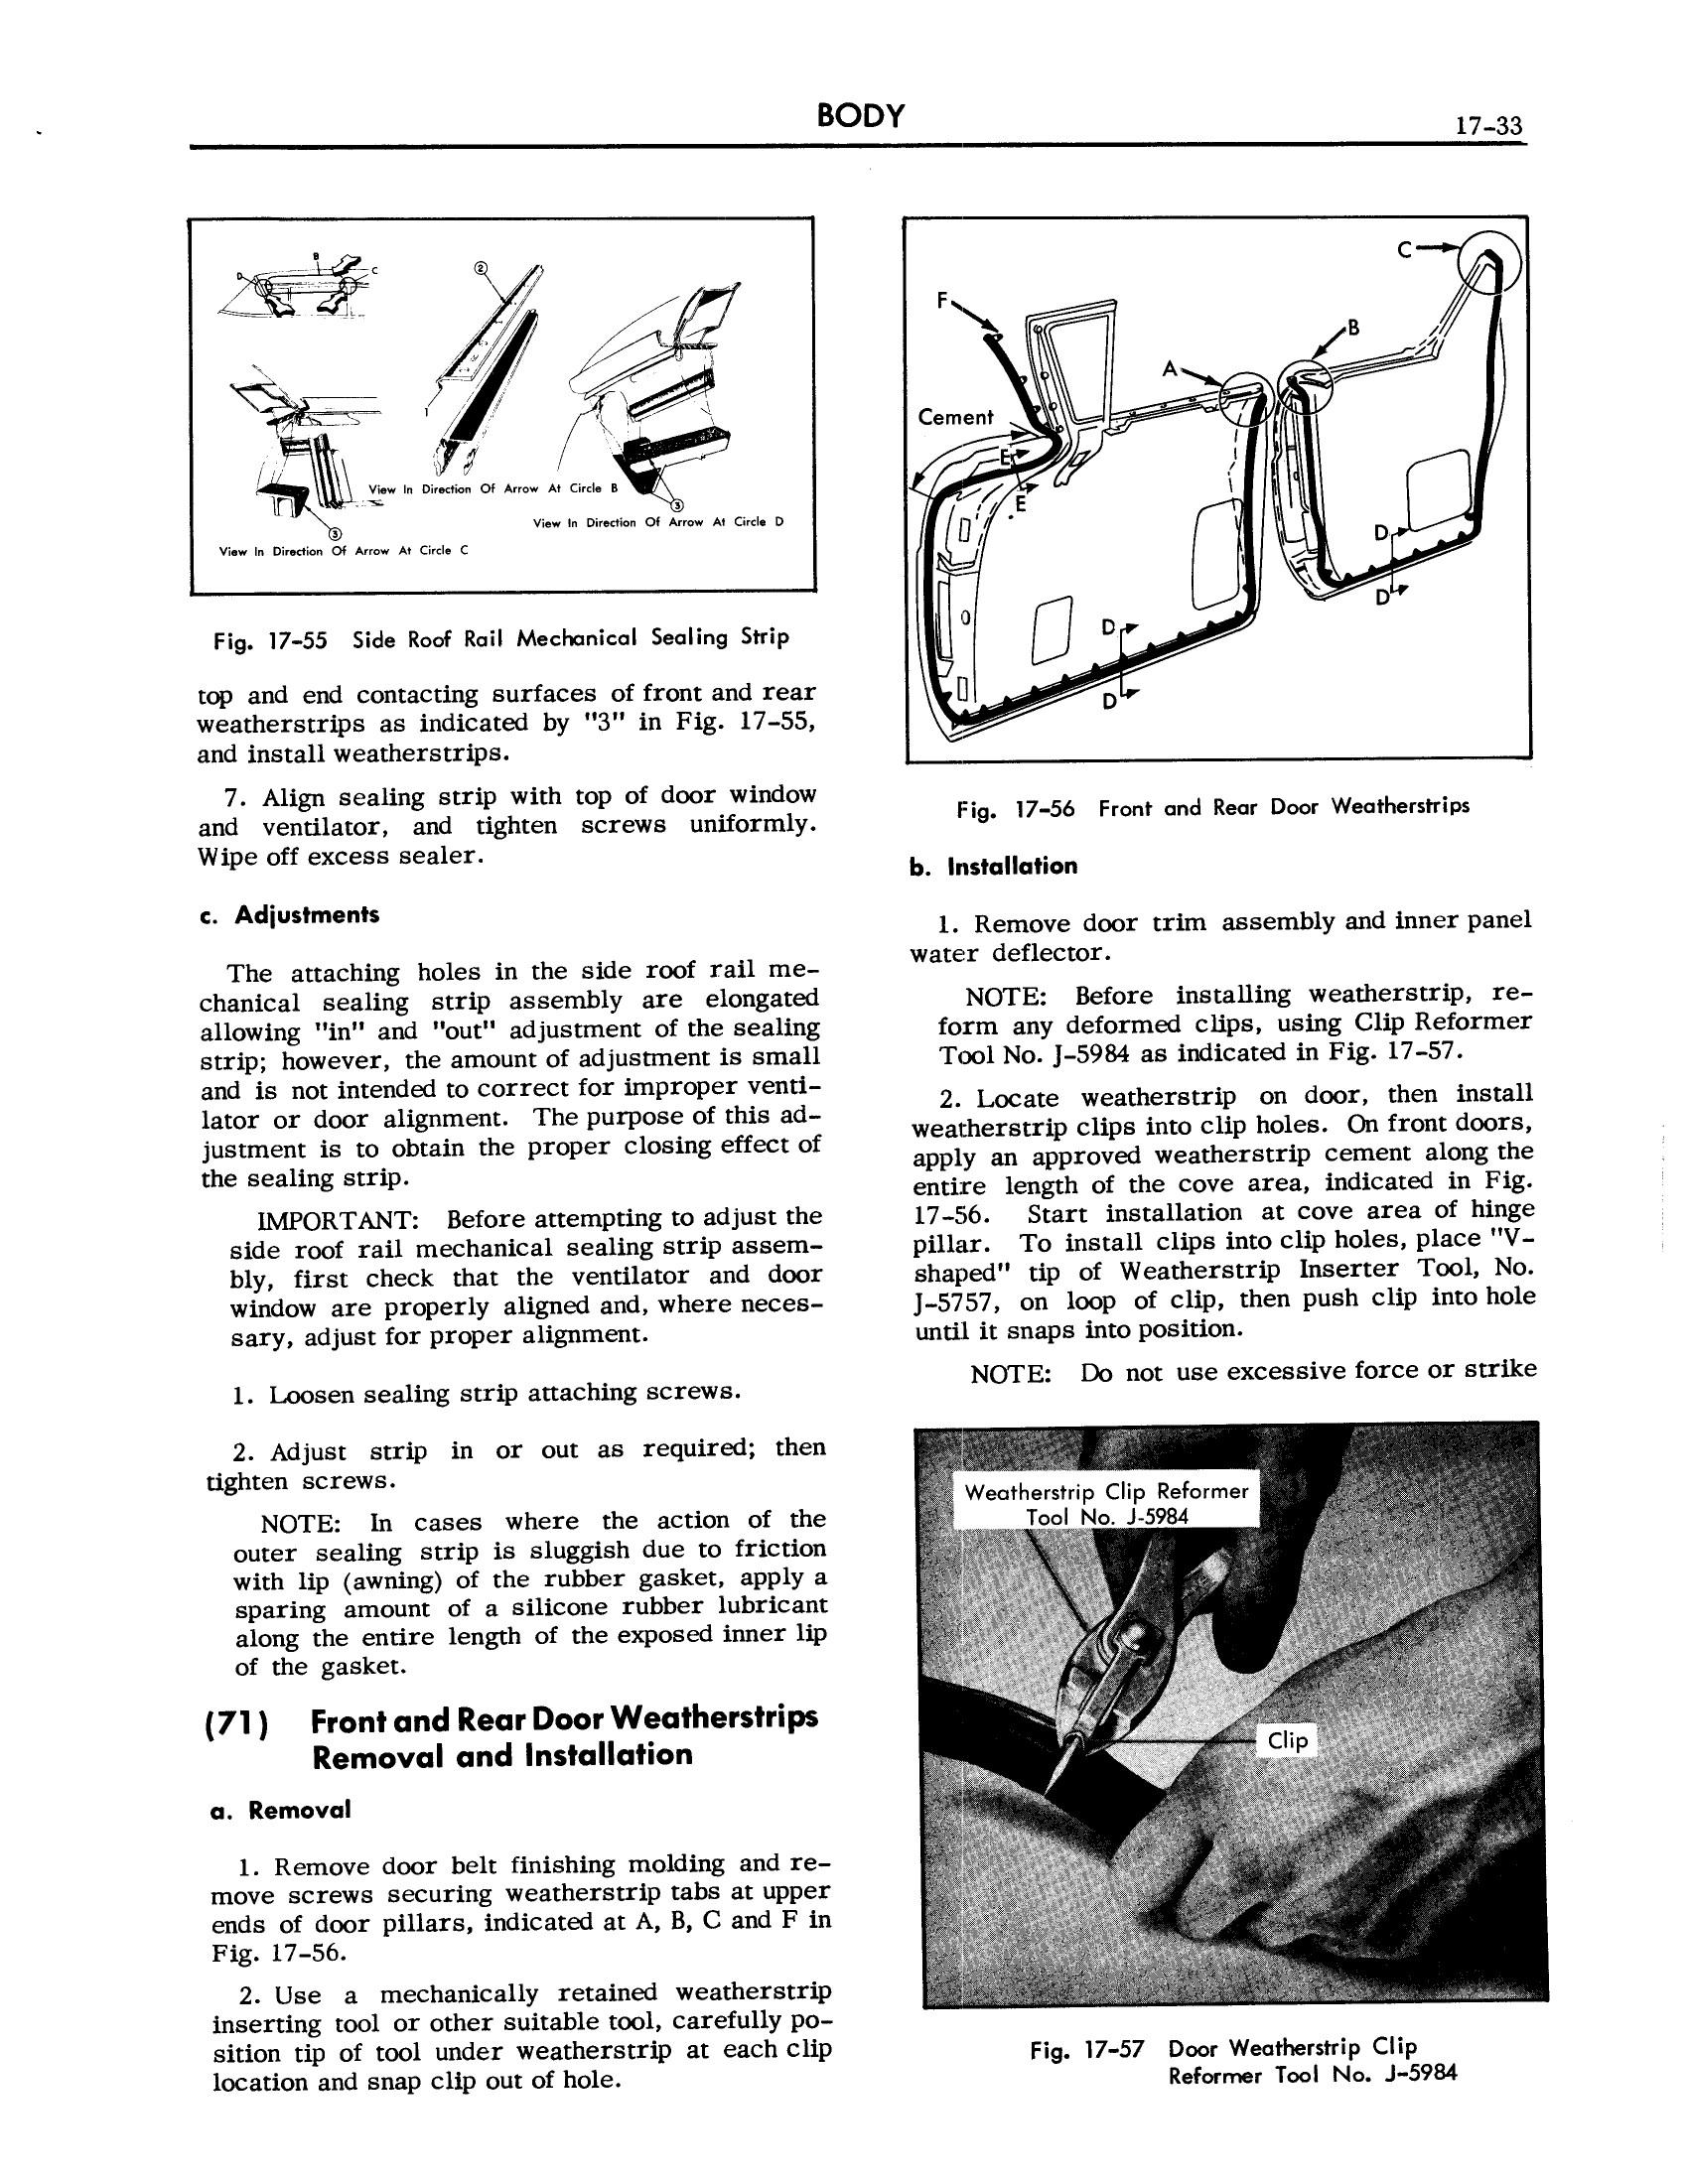 1957 Cadillac Shop Manual- Body Page 33 of 76